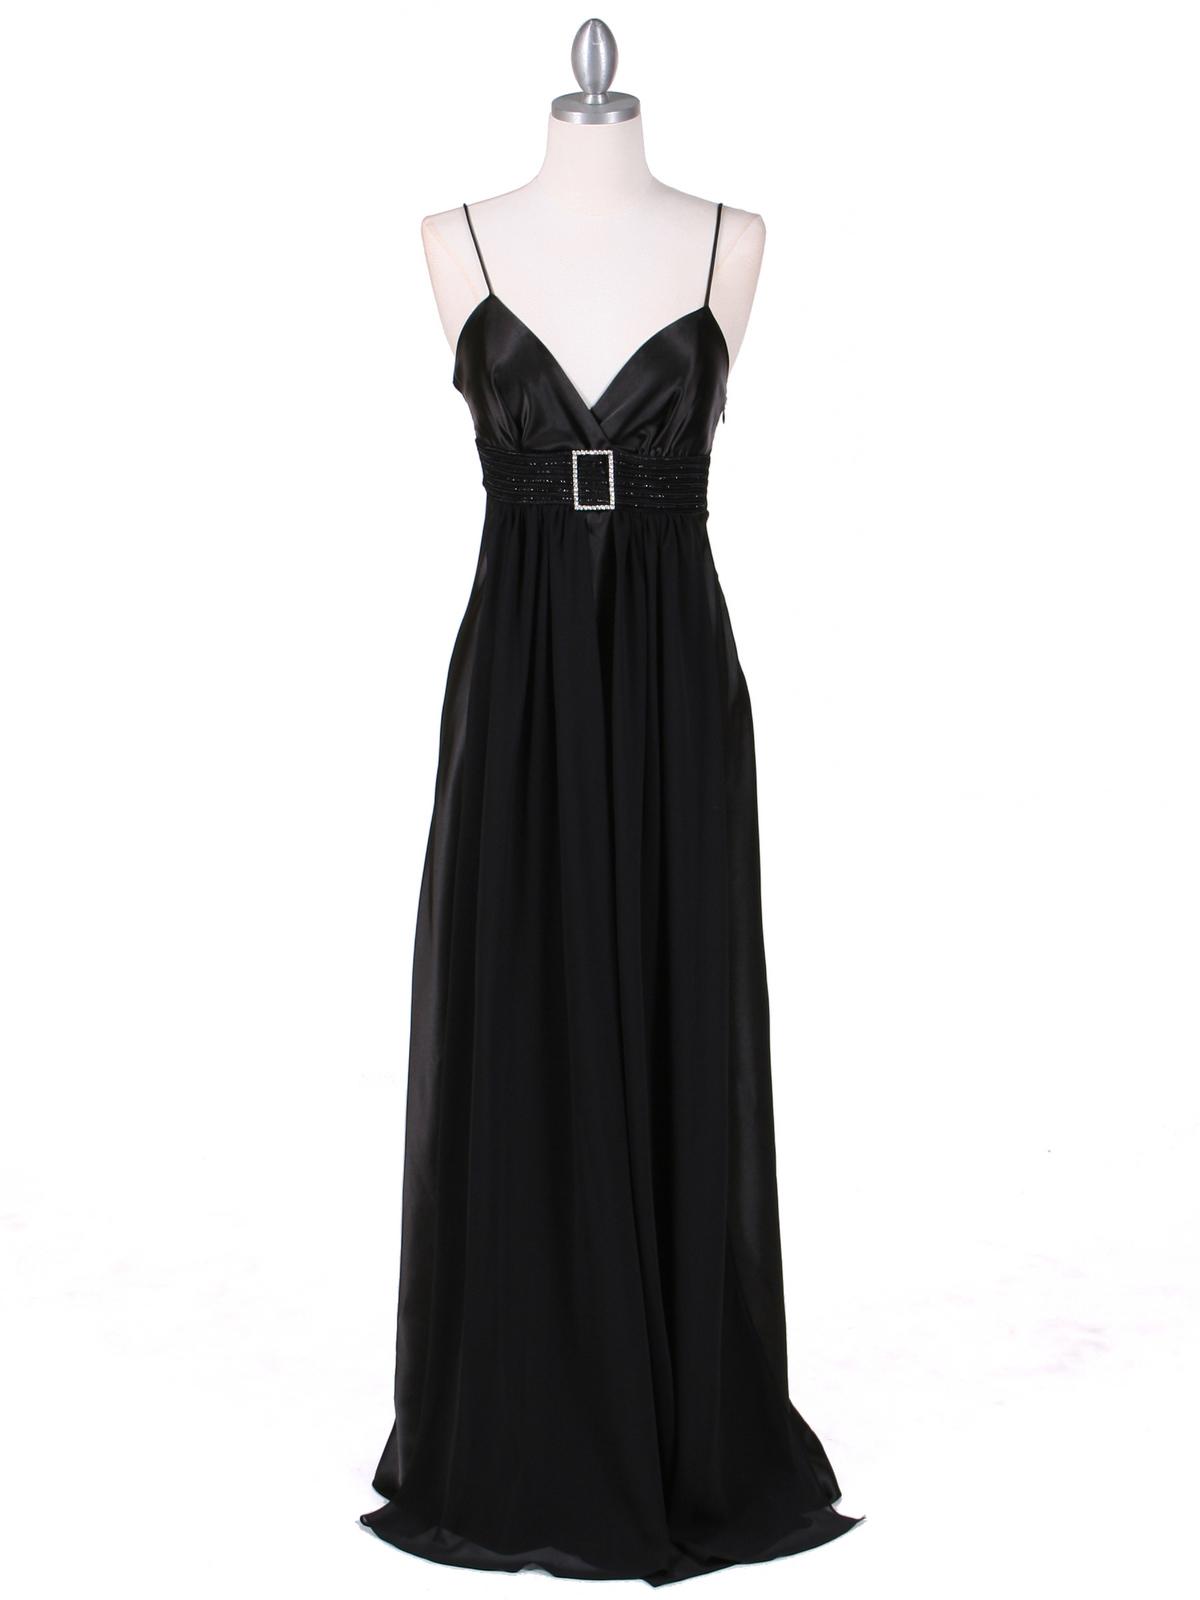 Black Satin Evening Gown | Sung Boutique L.A.